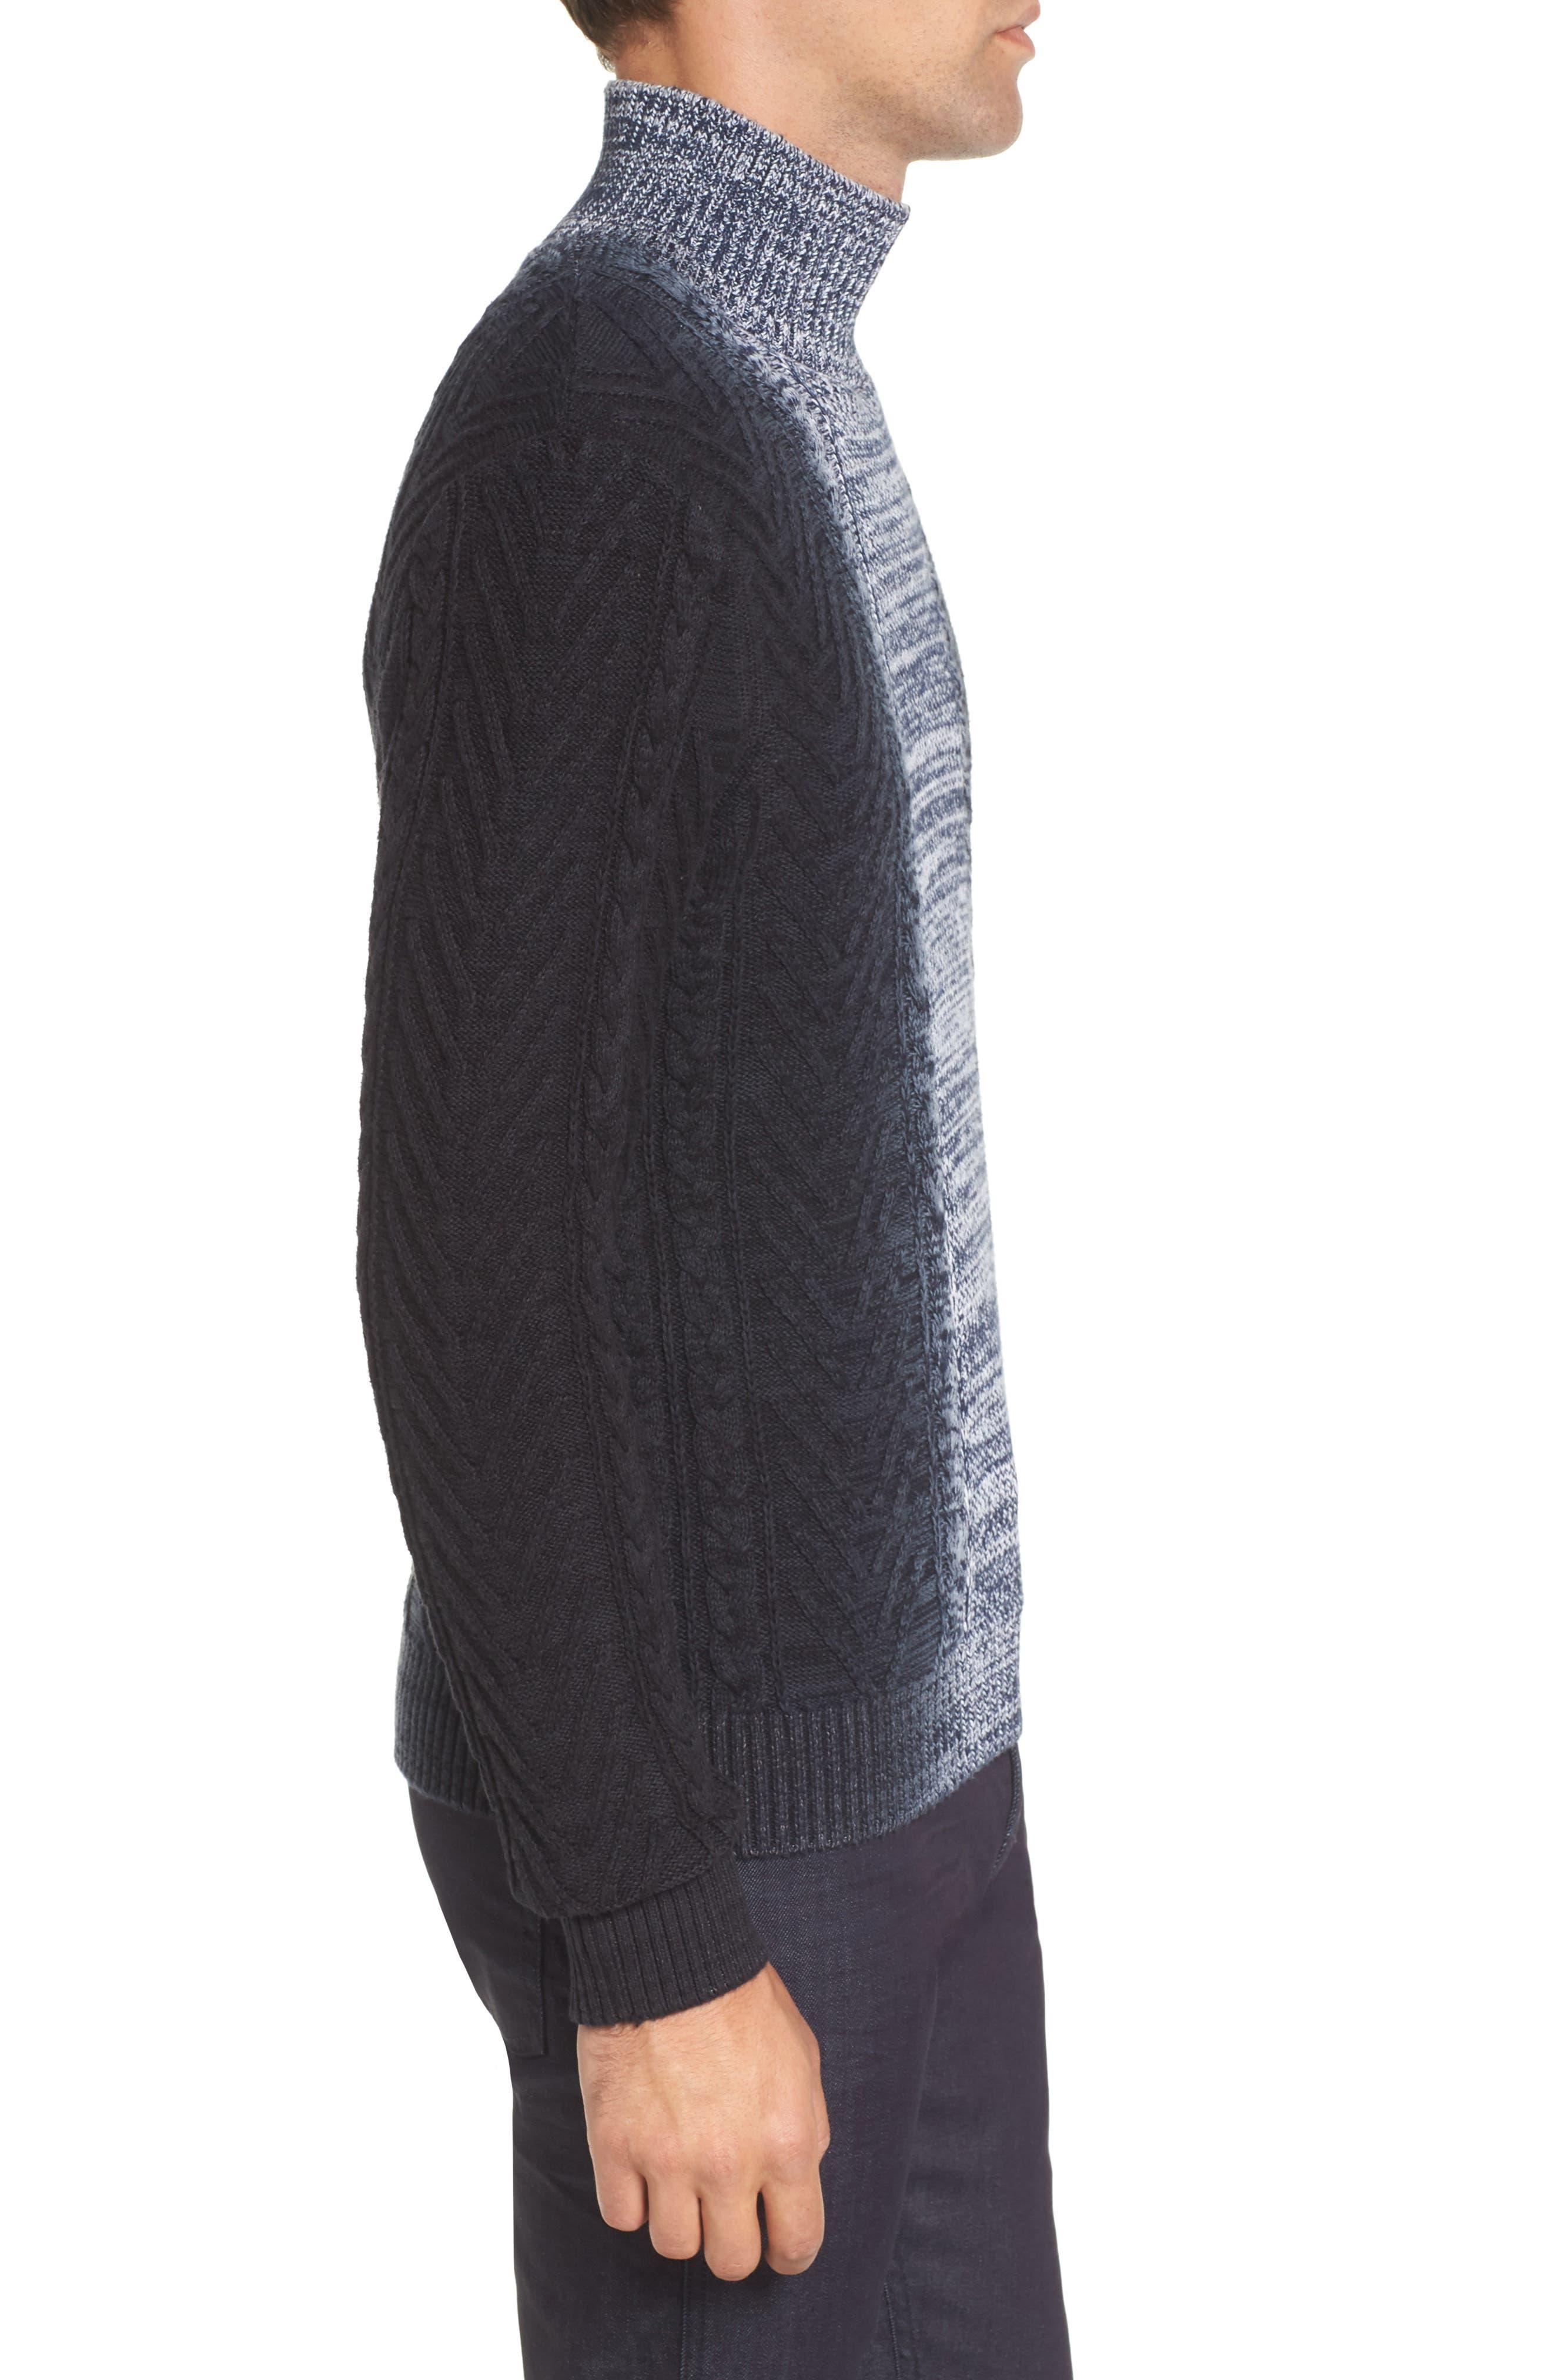 Alternate Image 3  - Vince Camuto Gradient Fade Turtleneck Sweater